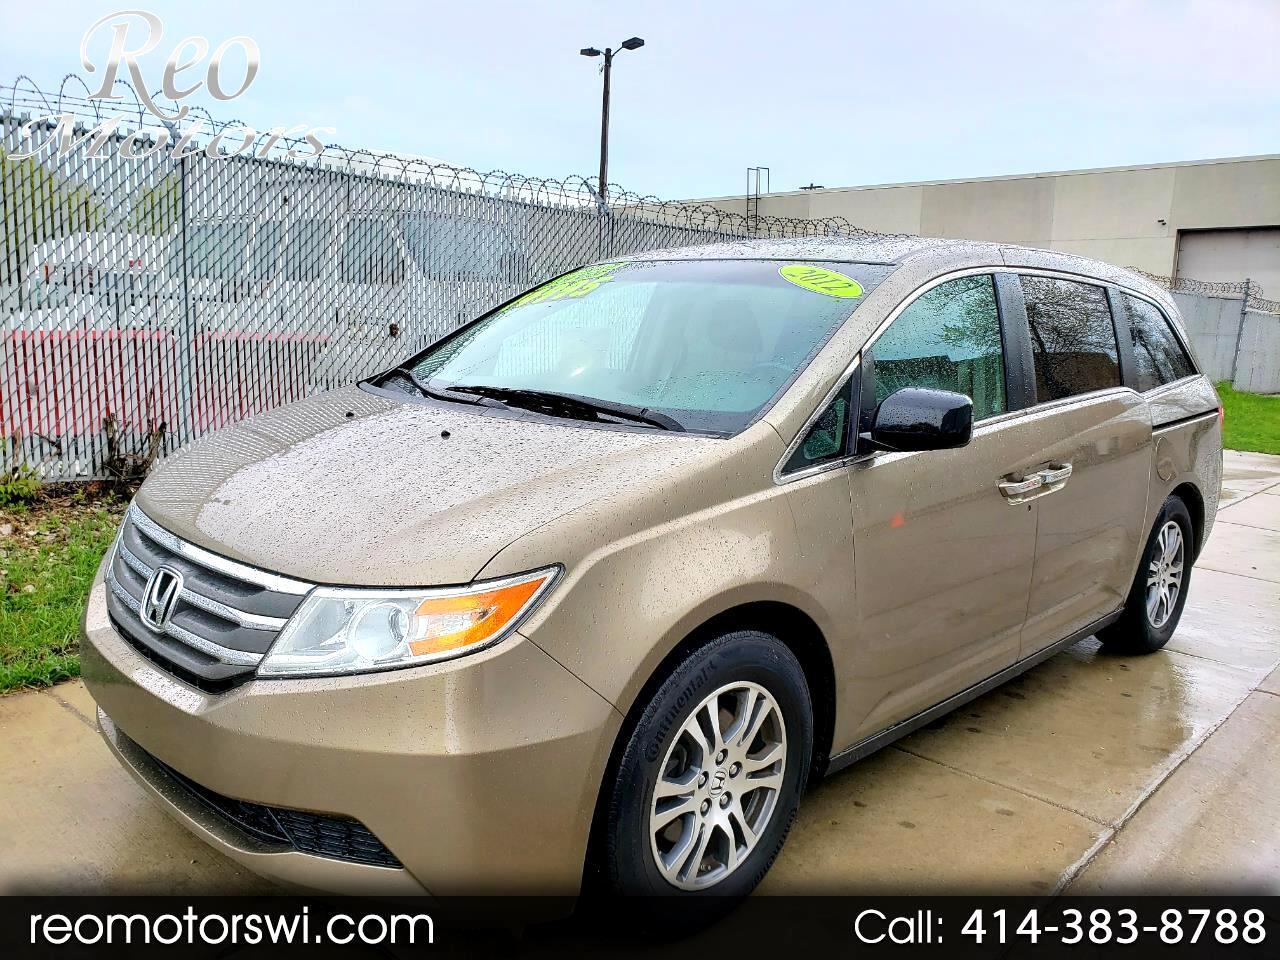 2012 Honda Odyssey FWD